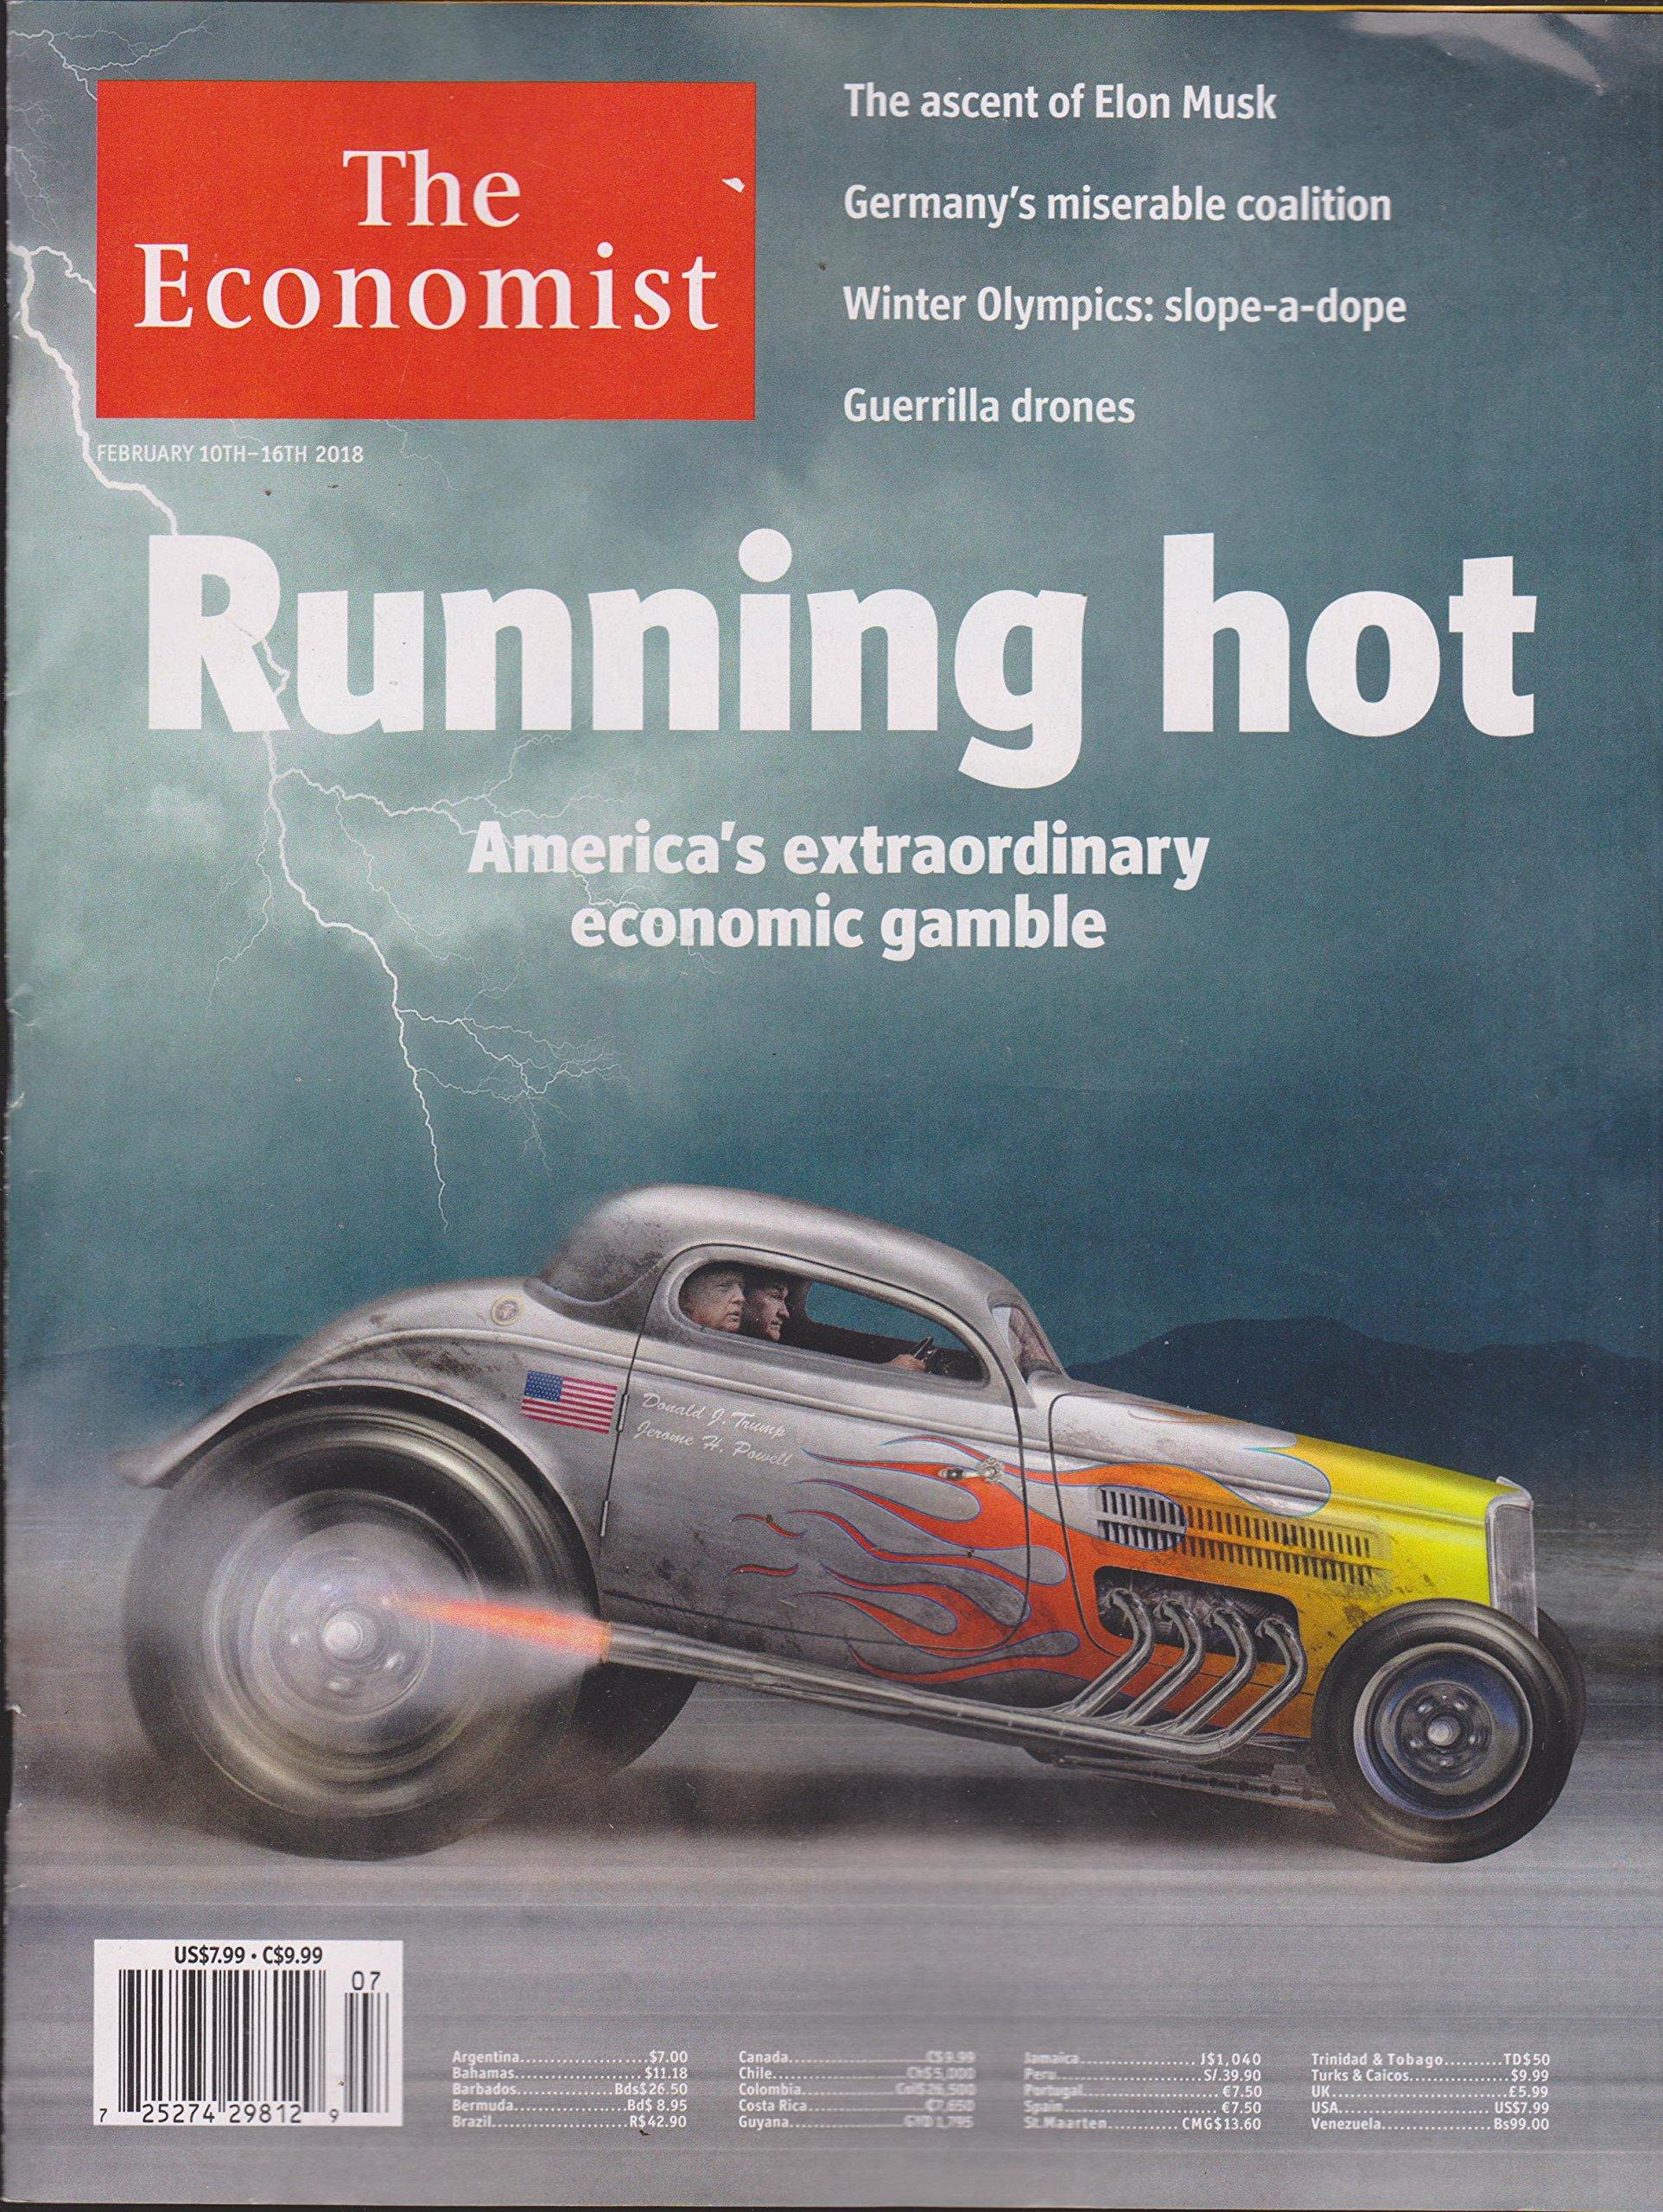 Download The Economist Magazine February 10TH-16TH 2018 pdf epub